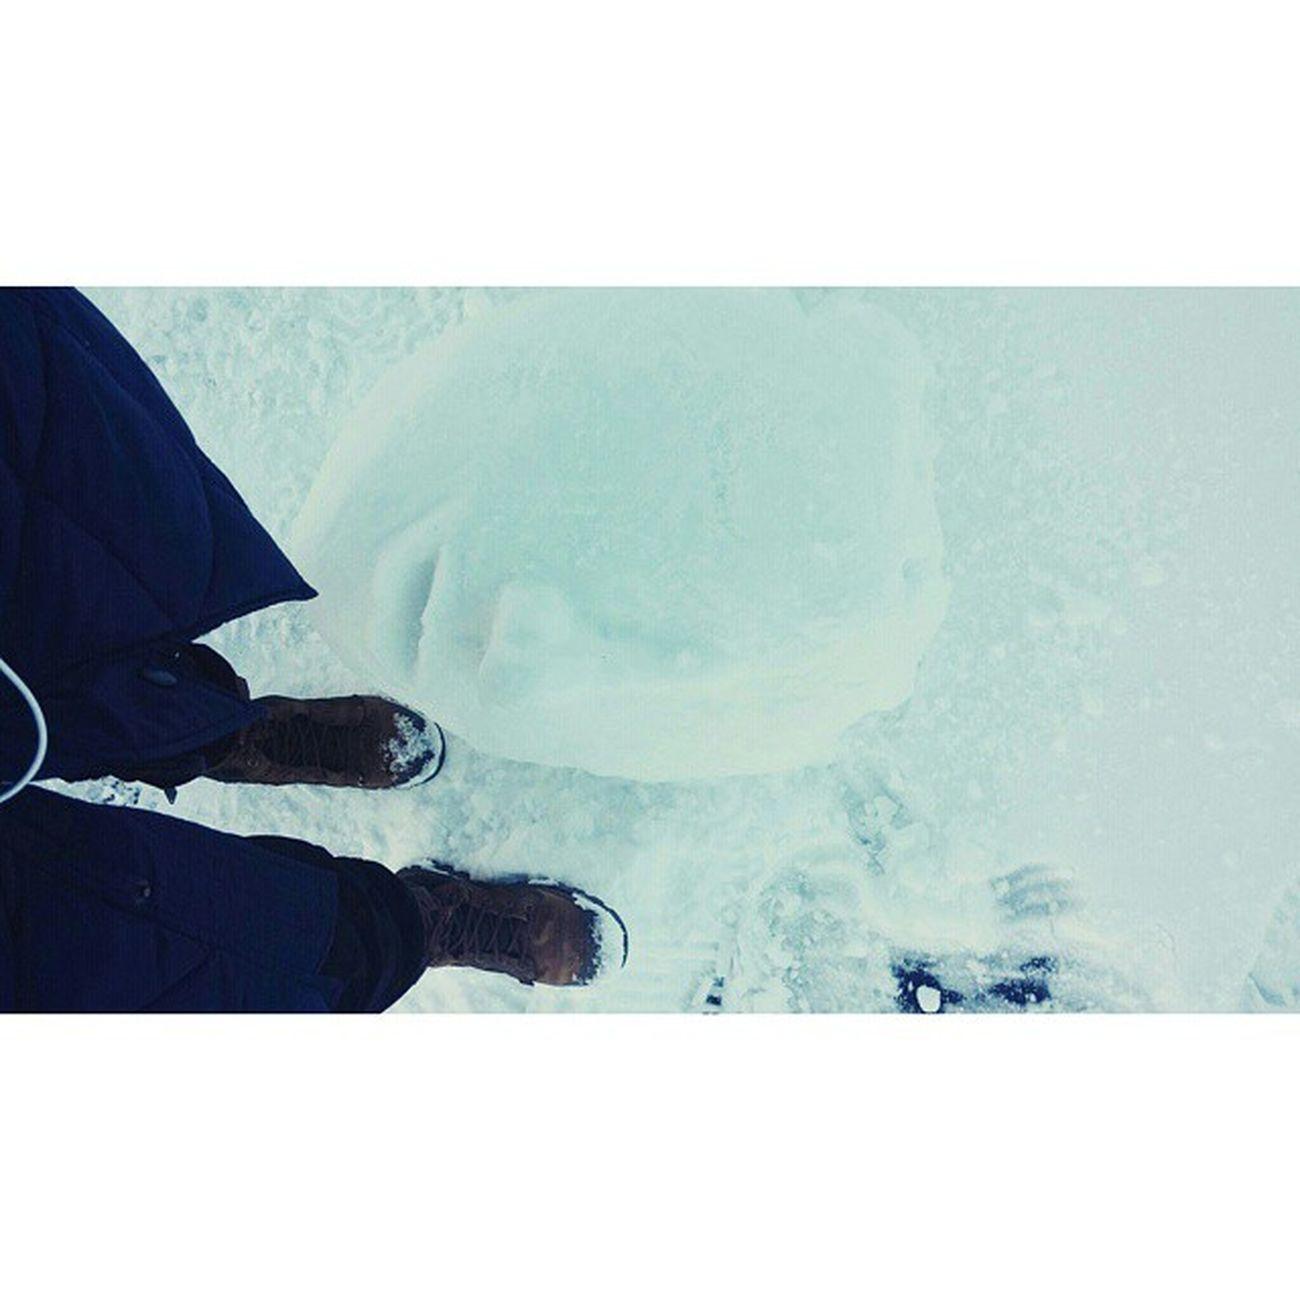 do you wanna build a snowman~⛄♥ 우크라이나 키예프 Kiev 드네프르강 에서 4시간 덜덜 떨면서 만든 Snowman 눈 눈사람 발스타그램 신스타그램 팔라디움 팔라듐